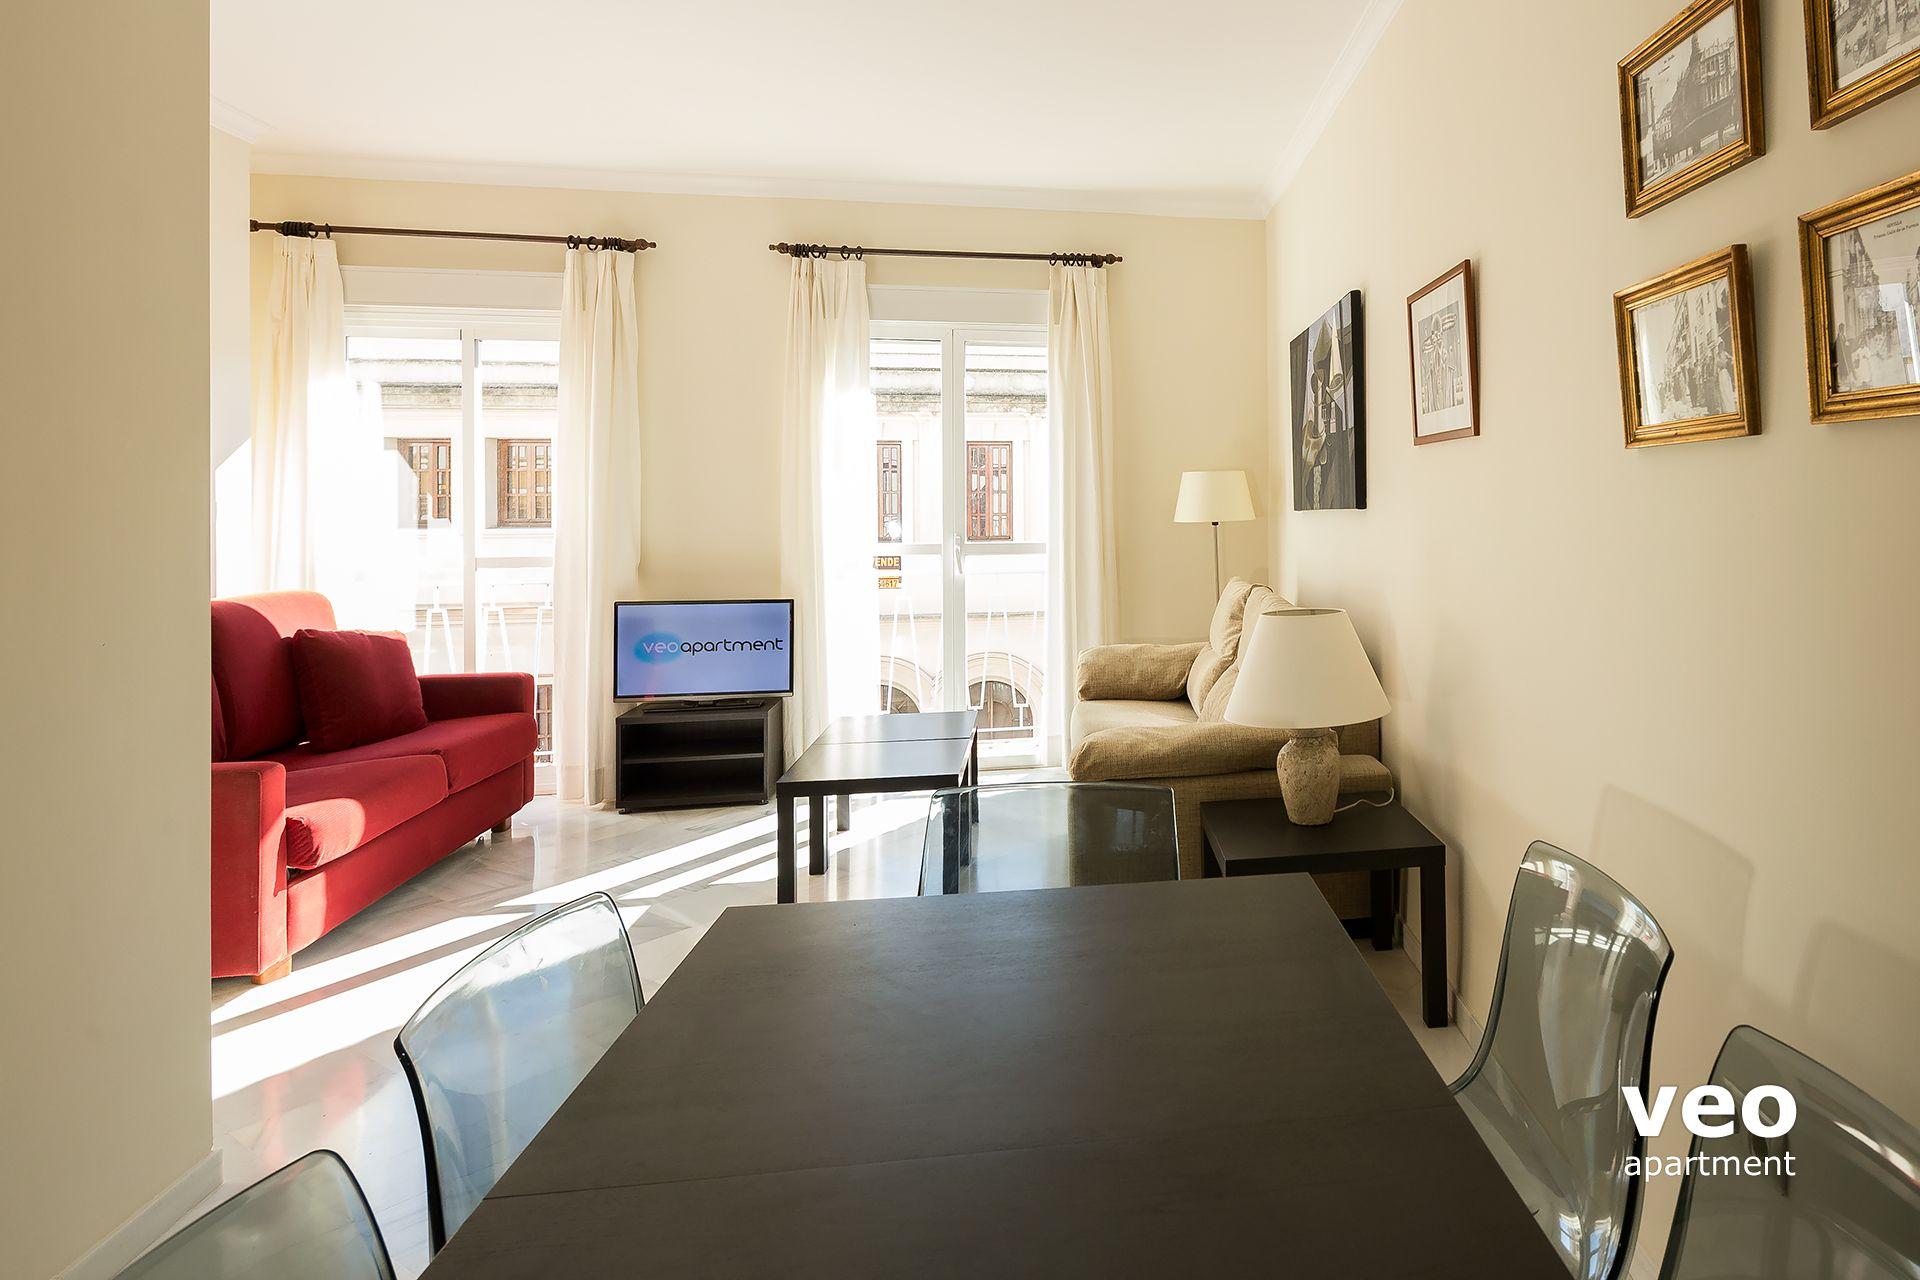 Appartement Rue Rioja Seville Espagne